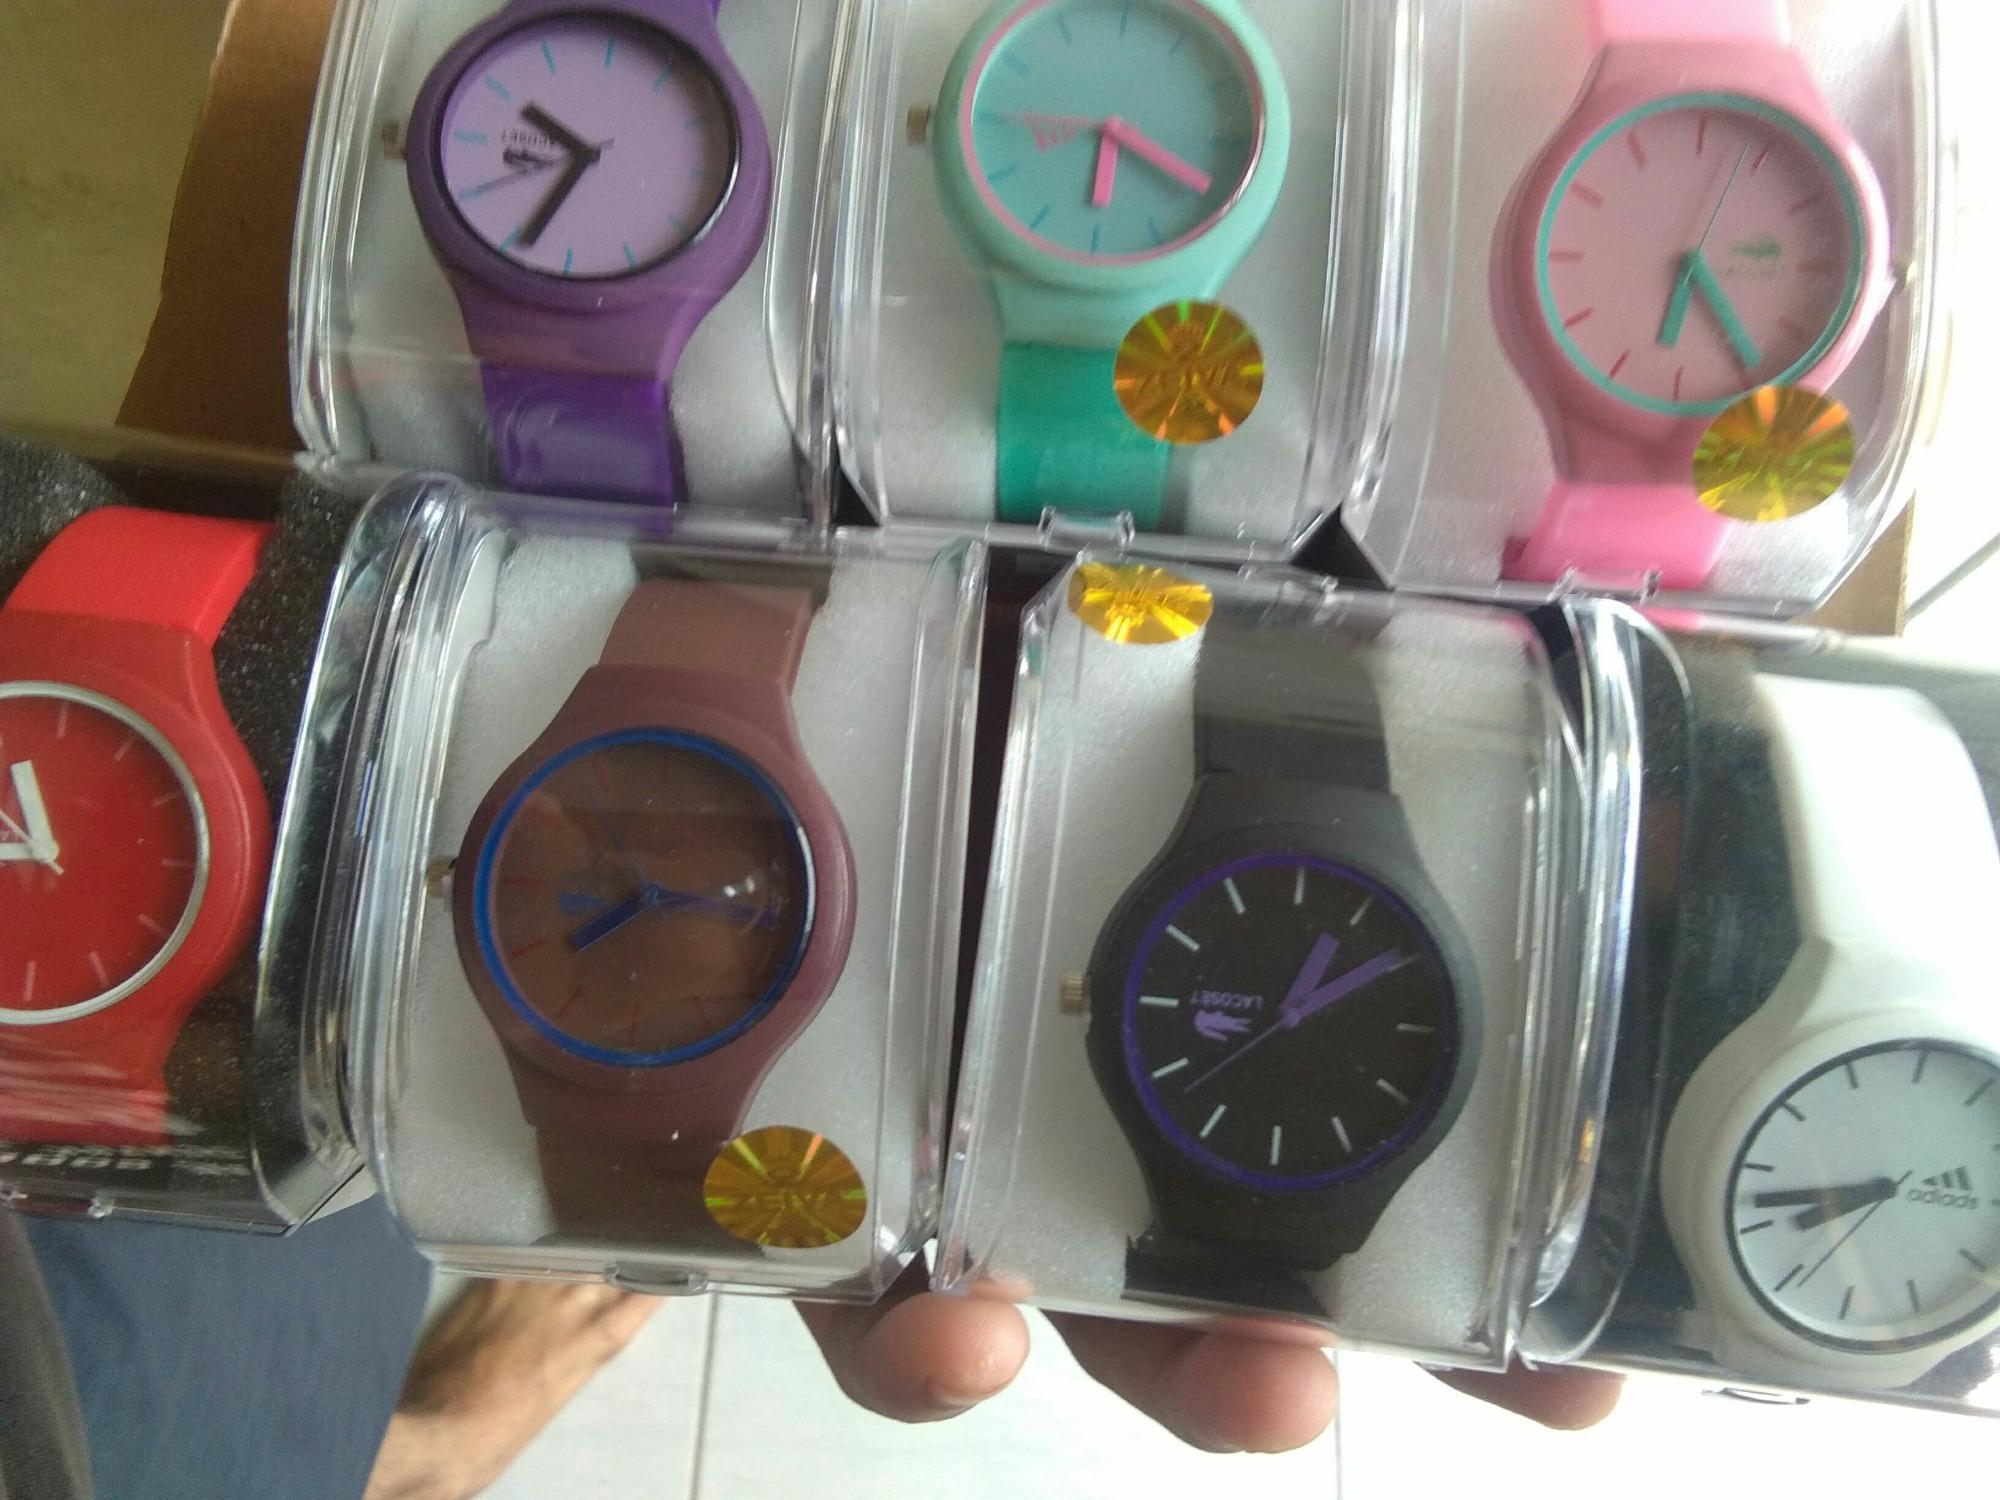 Jam tangan Gaya Unisex Jelly karet 162edc6966